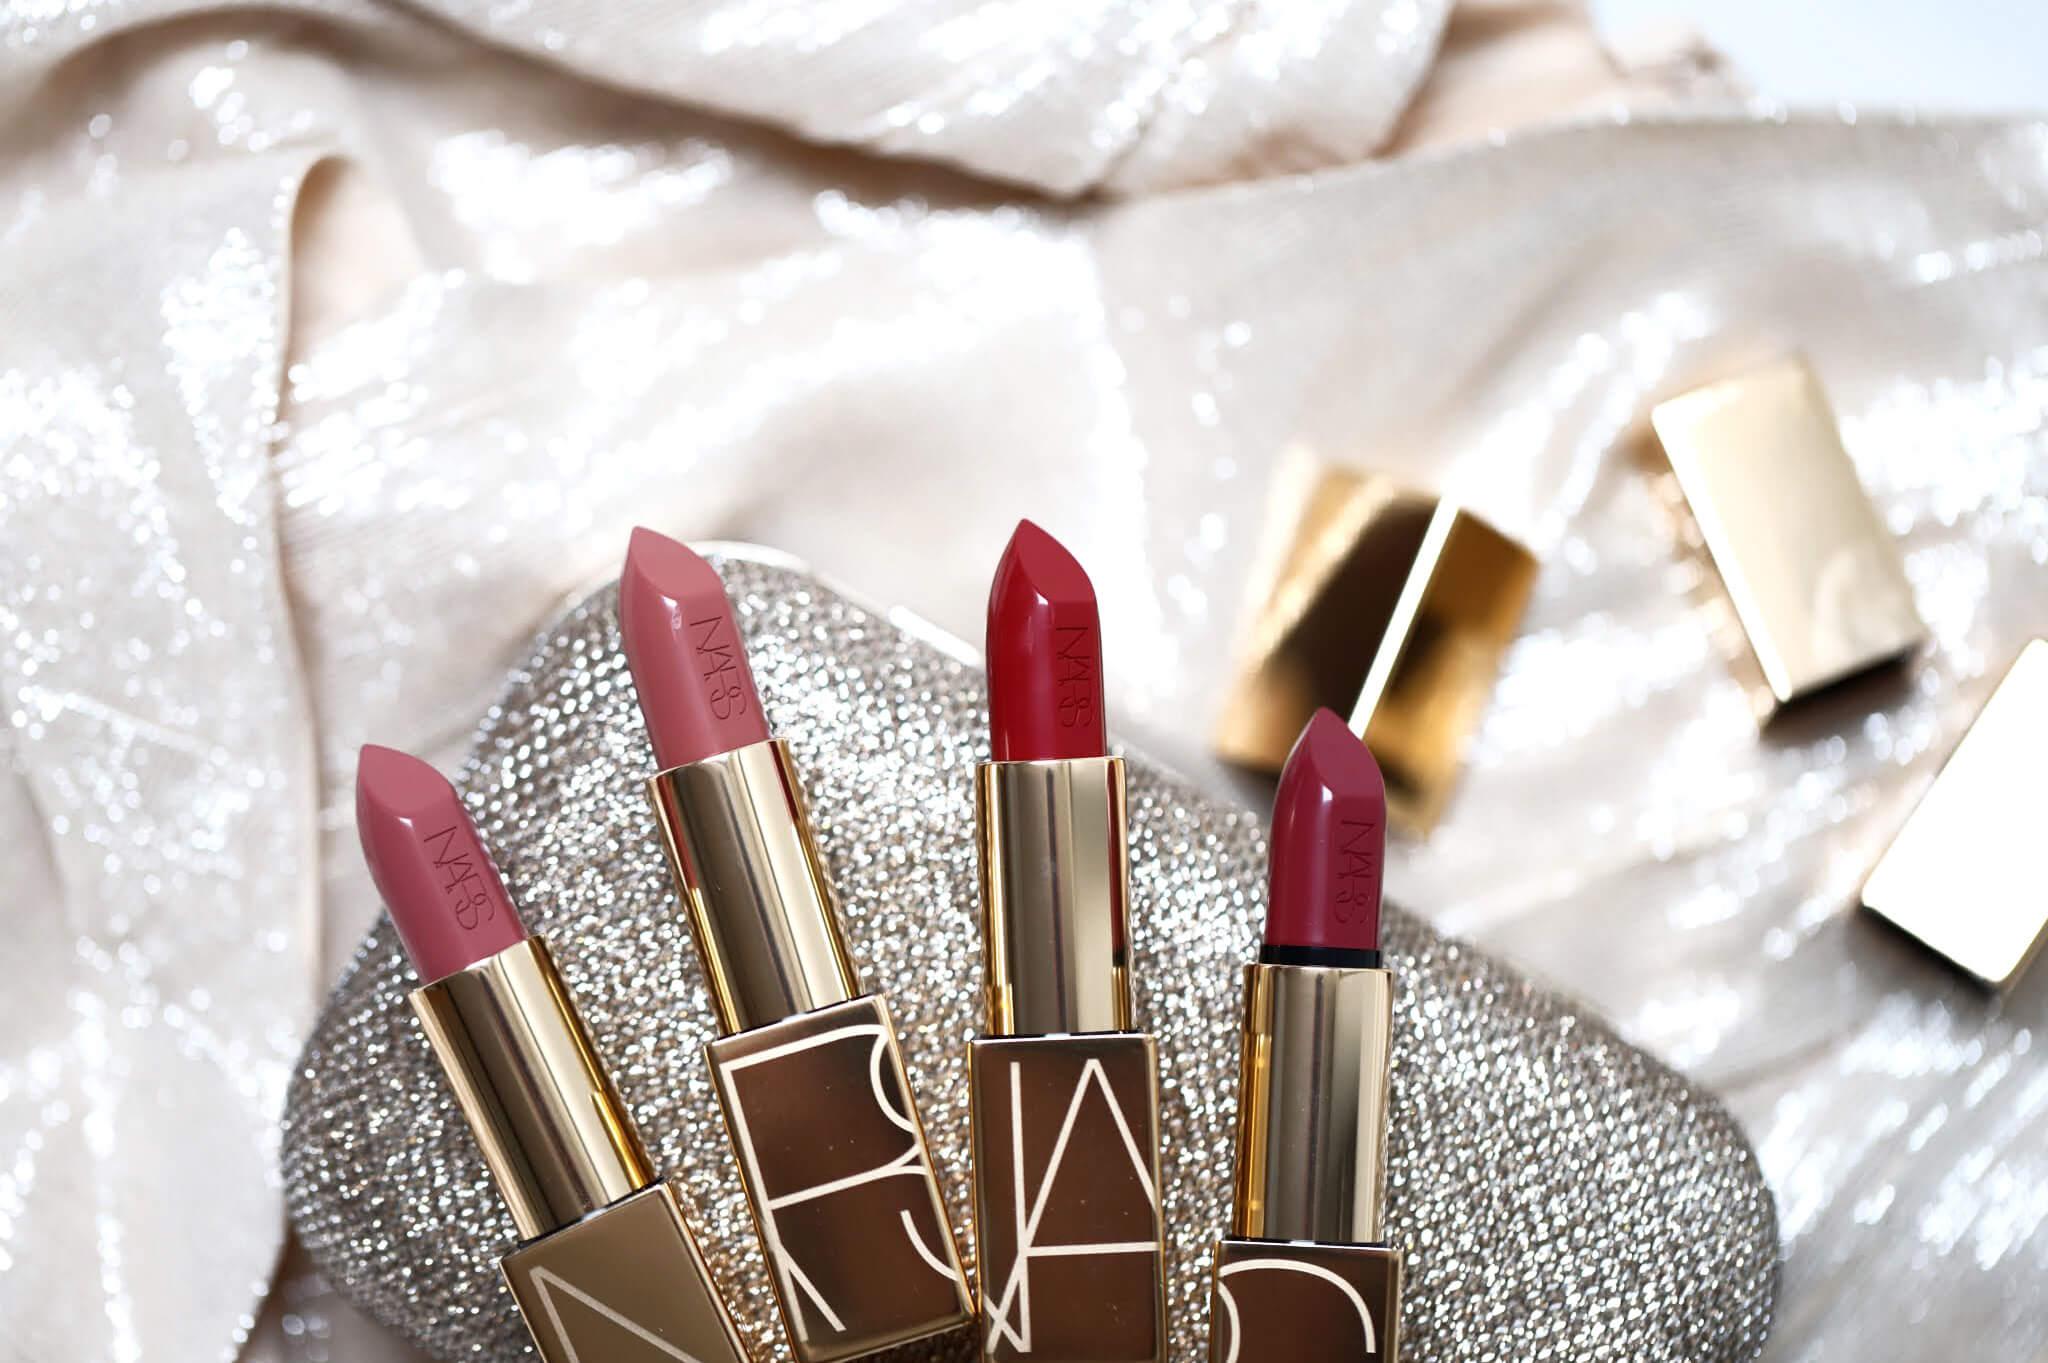 Nars VIP Audacious Lipstick Audrey Anita Rita Barbara